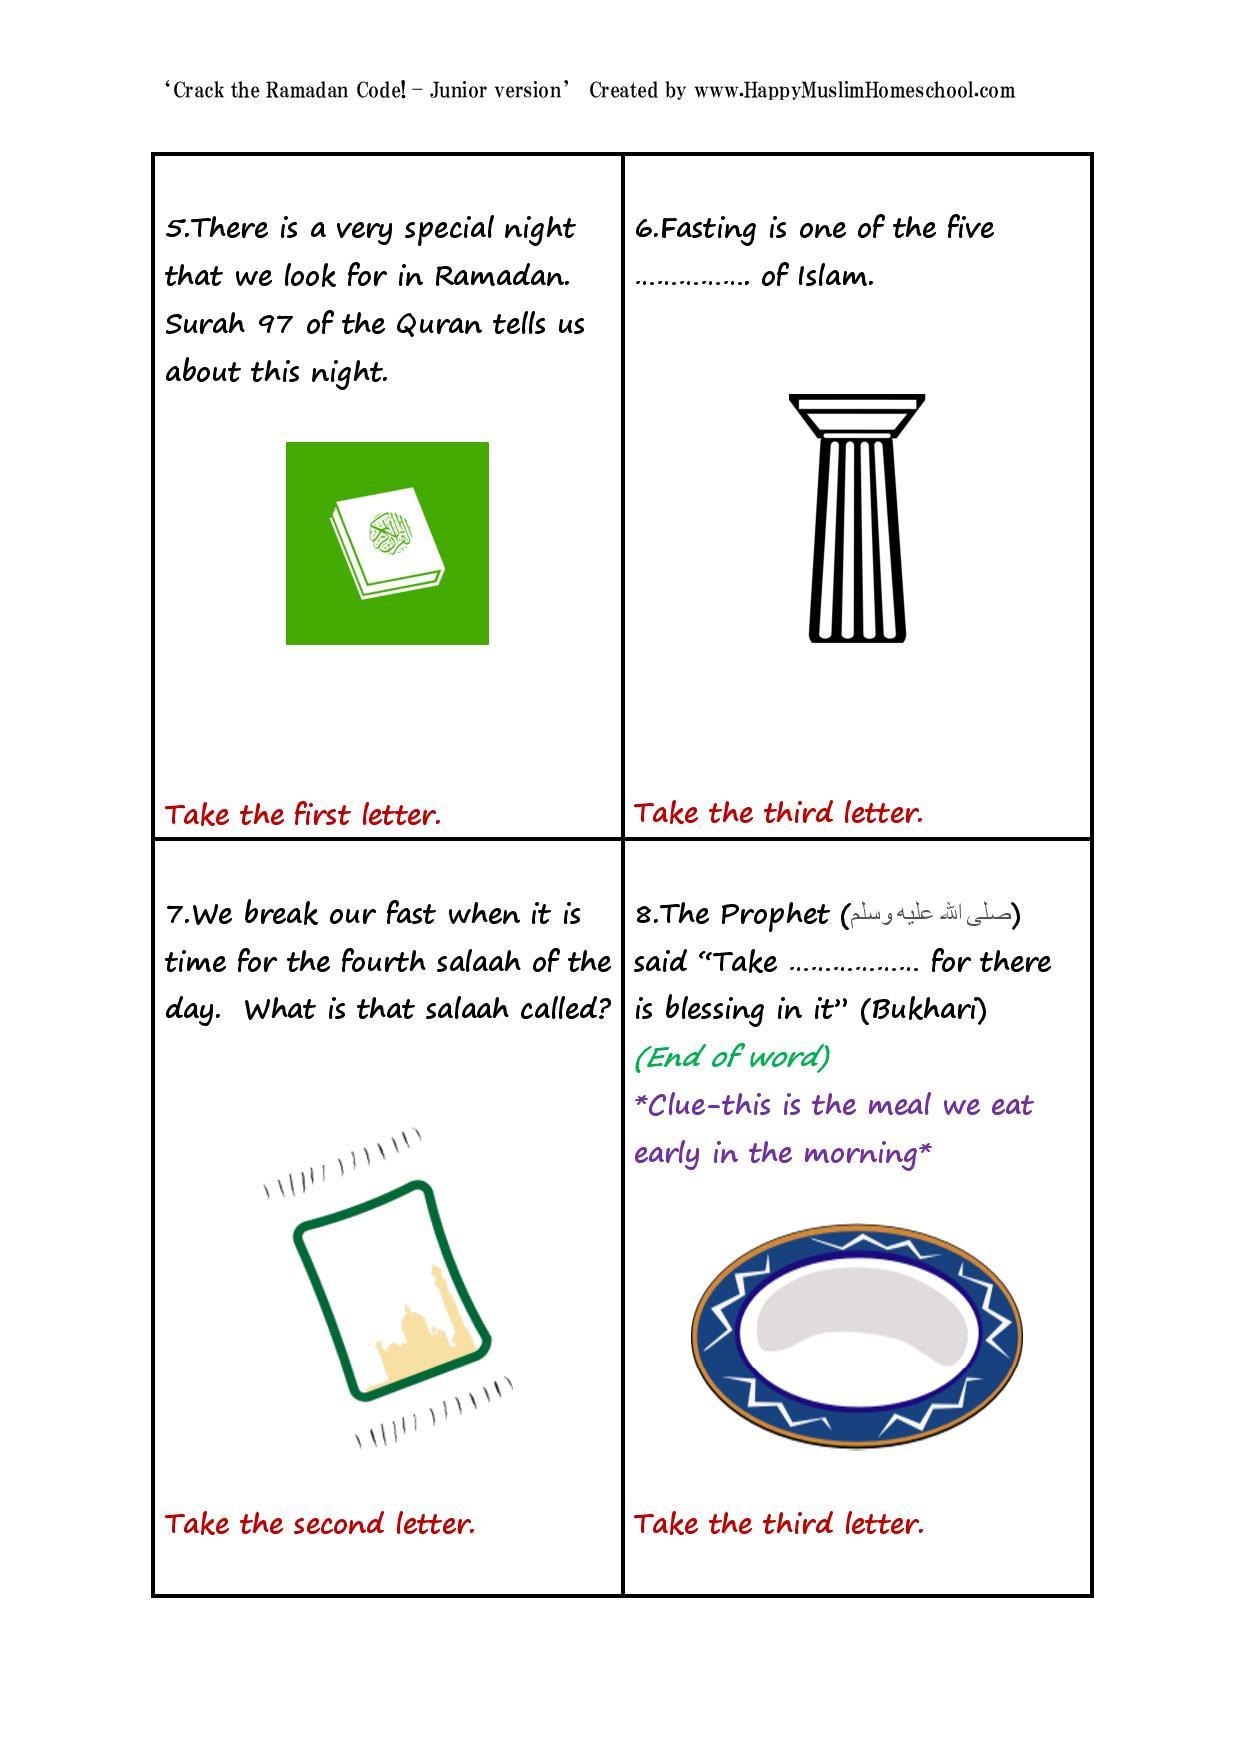 Crack The Ramadan Code Junior Edition